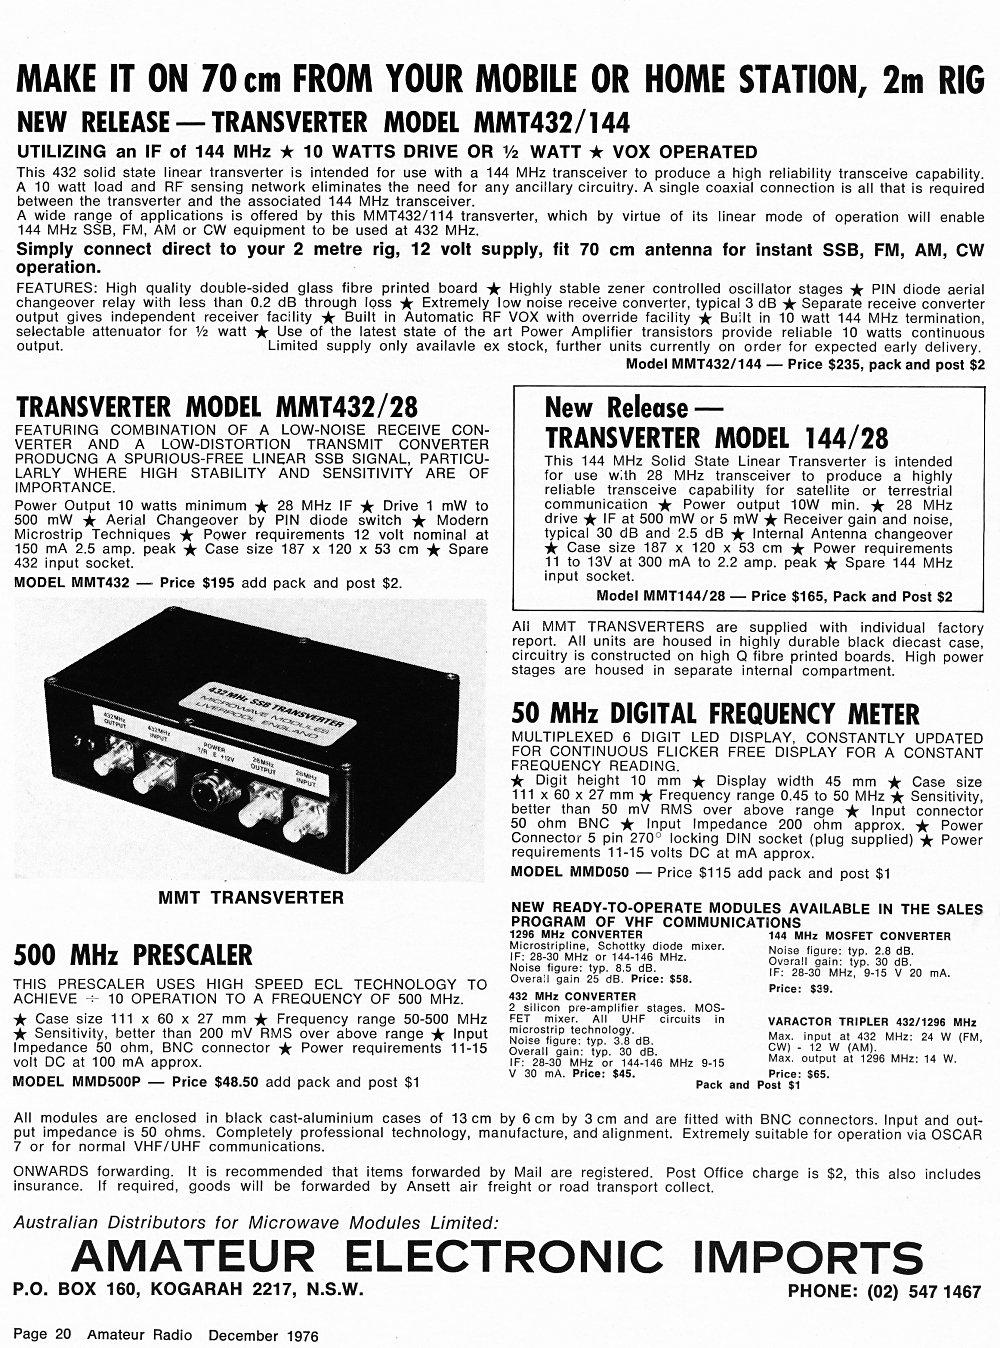 Amateur Radio Magazine 500mhz Pic Prescaler December